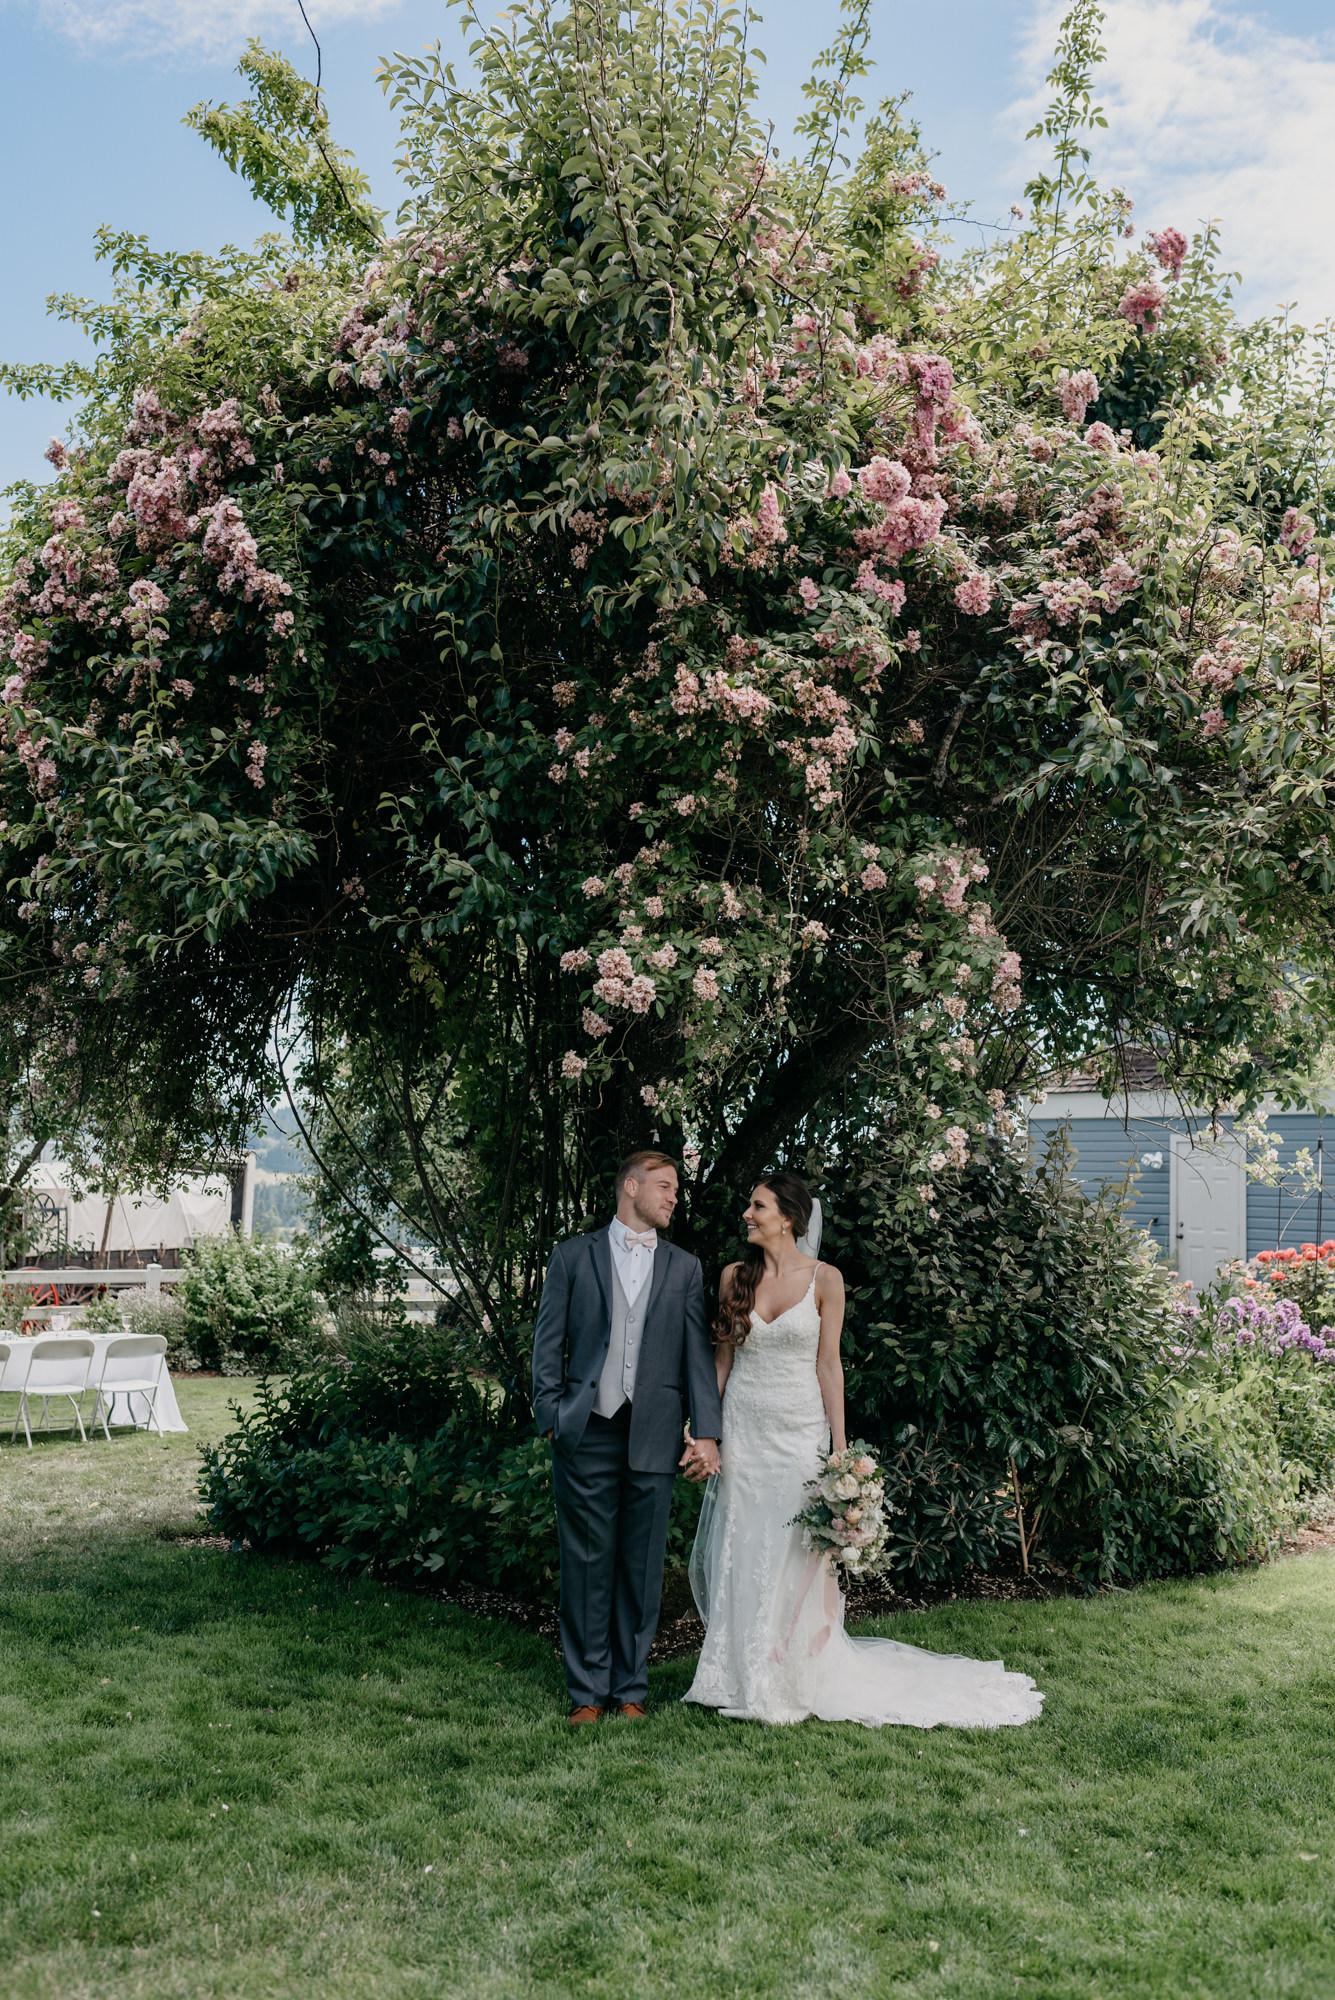 83-lake-oswego-wedding-portland-couple-rose-tree.jpg